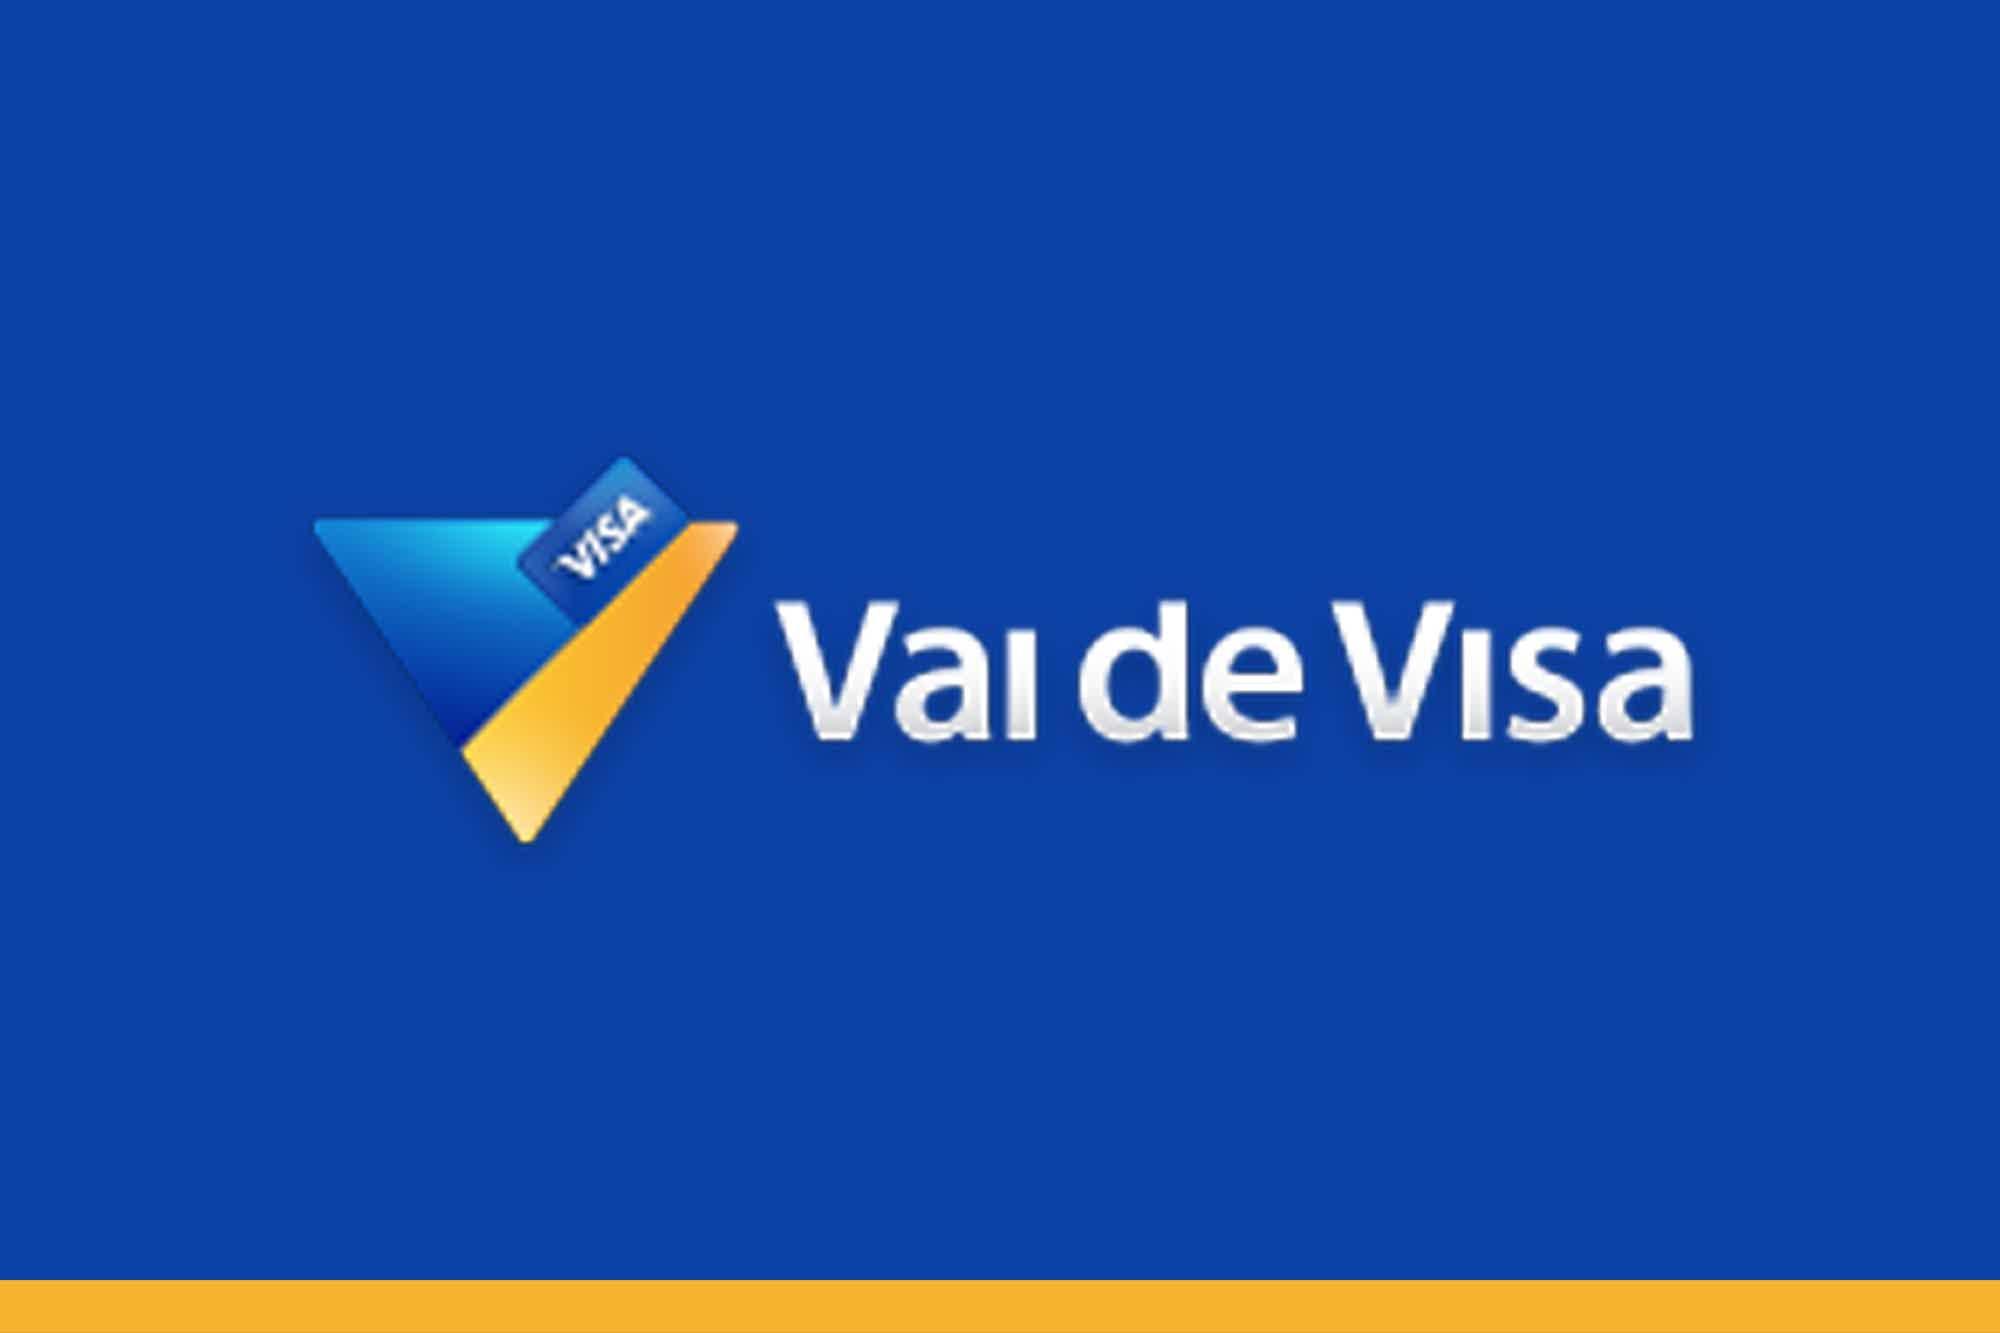 Bandeira Visa